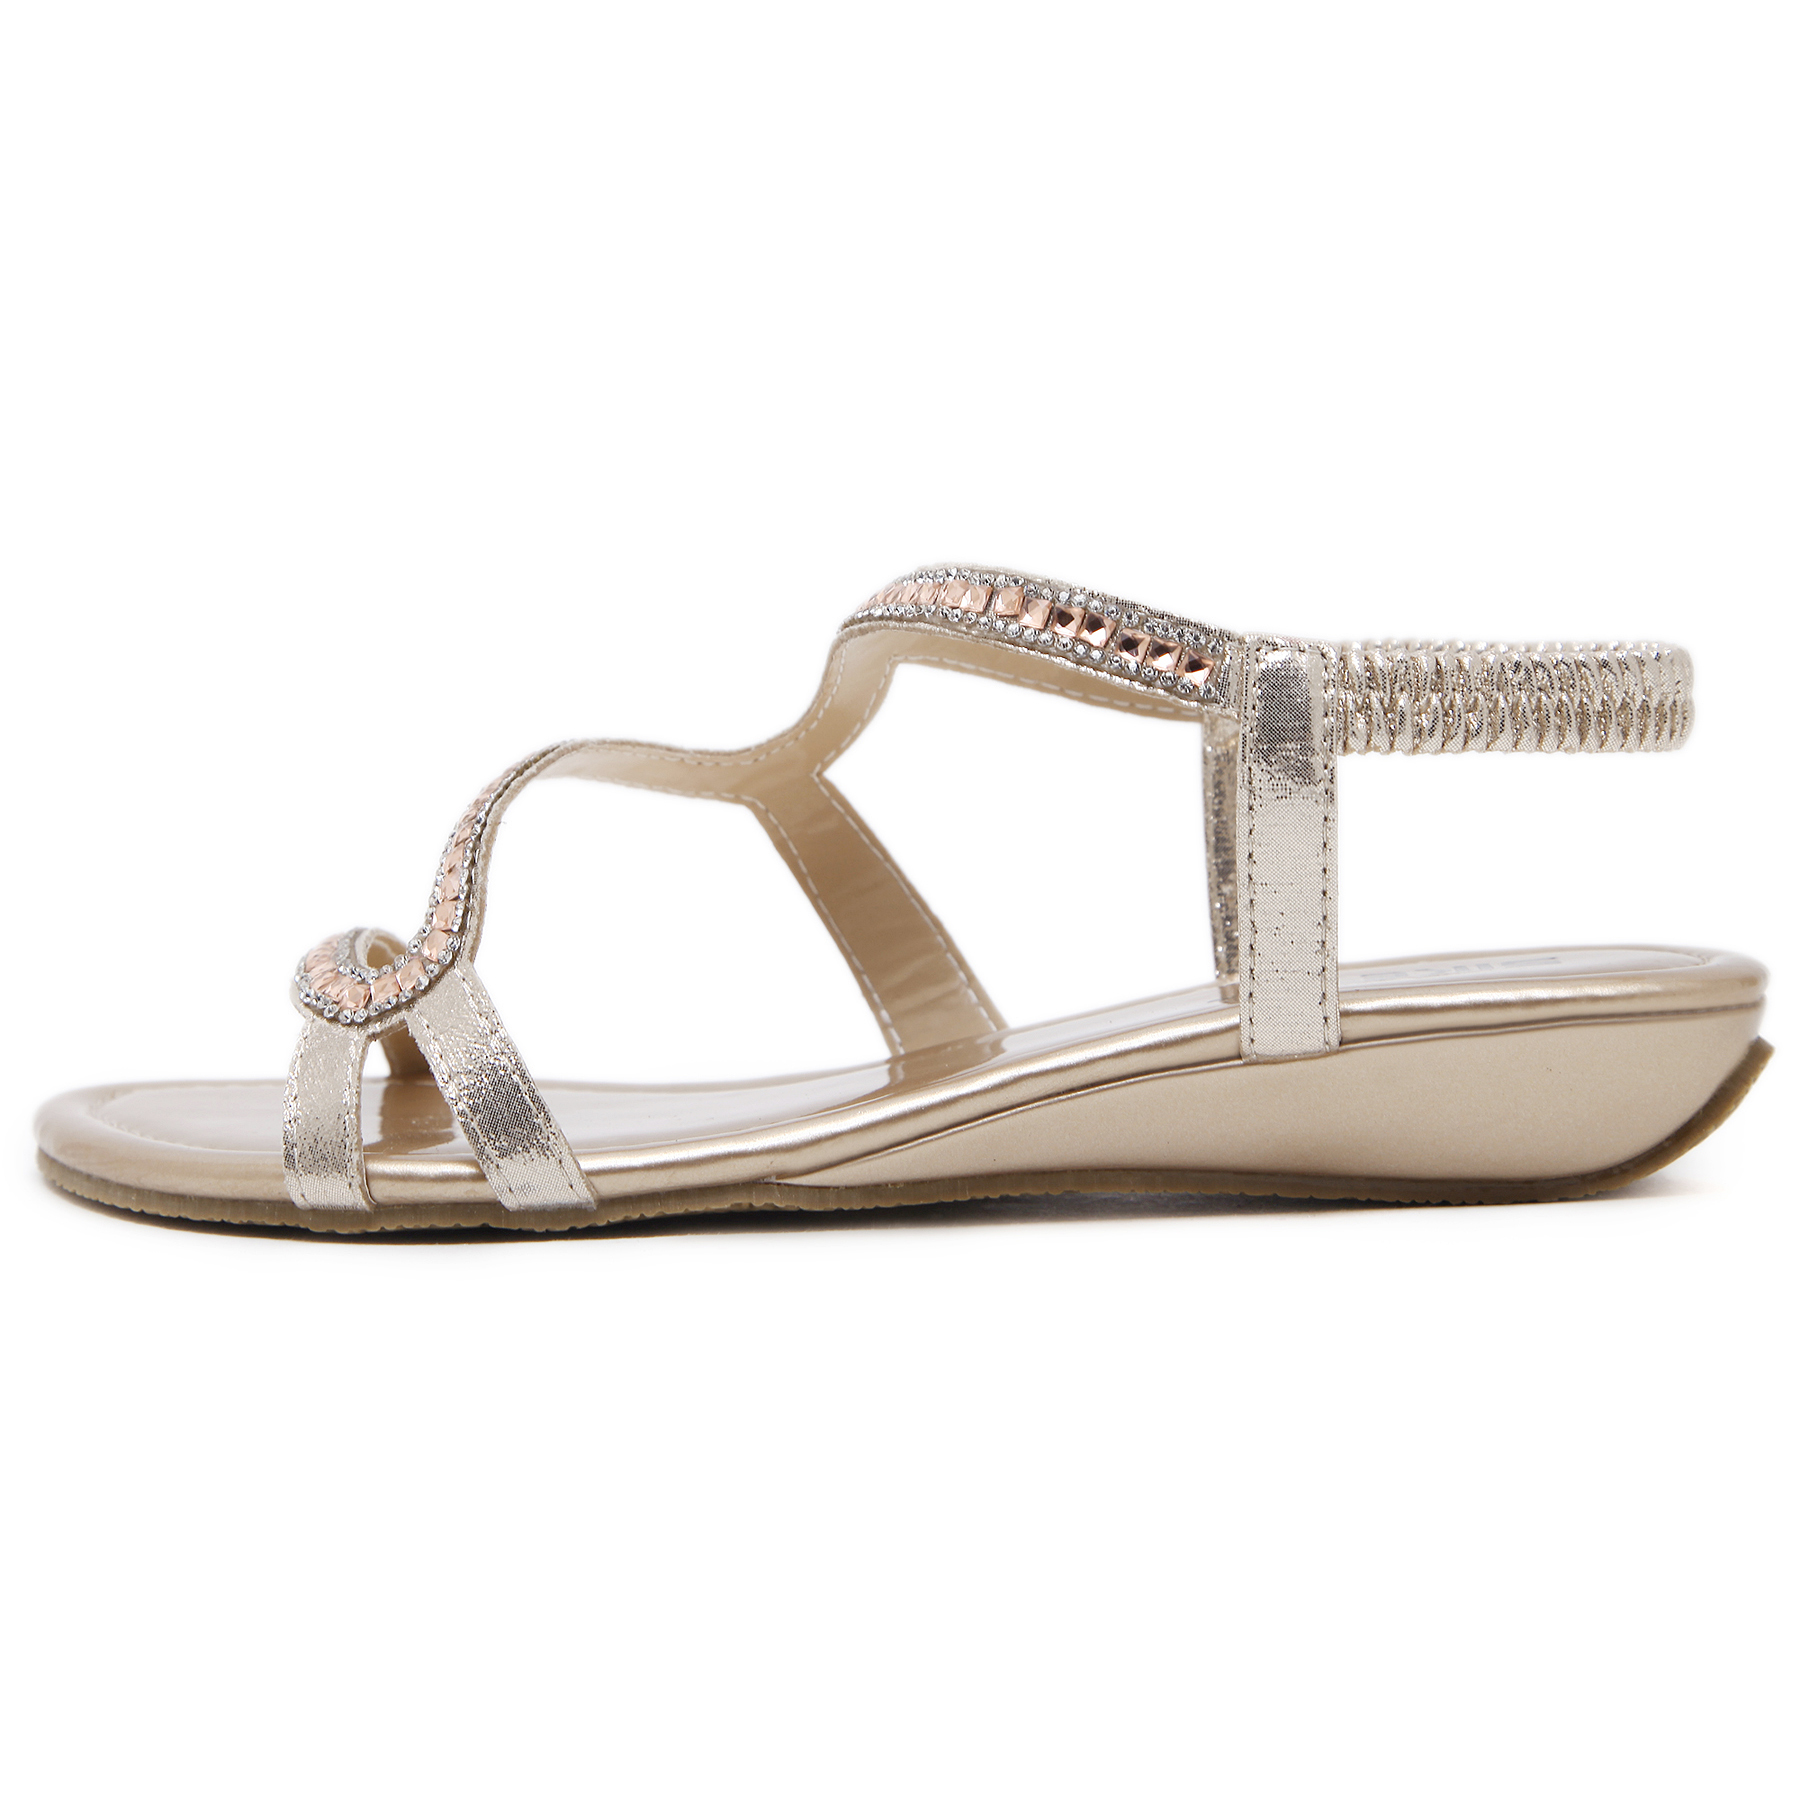 3724c41e90ee52 SEKETU New Designer diamond design Female Summer Sandals Rhinestone Wedges  Fashion Large Size 35 42 Women Sandals-in Low Heels from Shoes on  Aliexpress.com ...